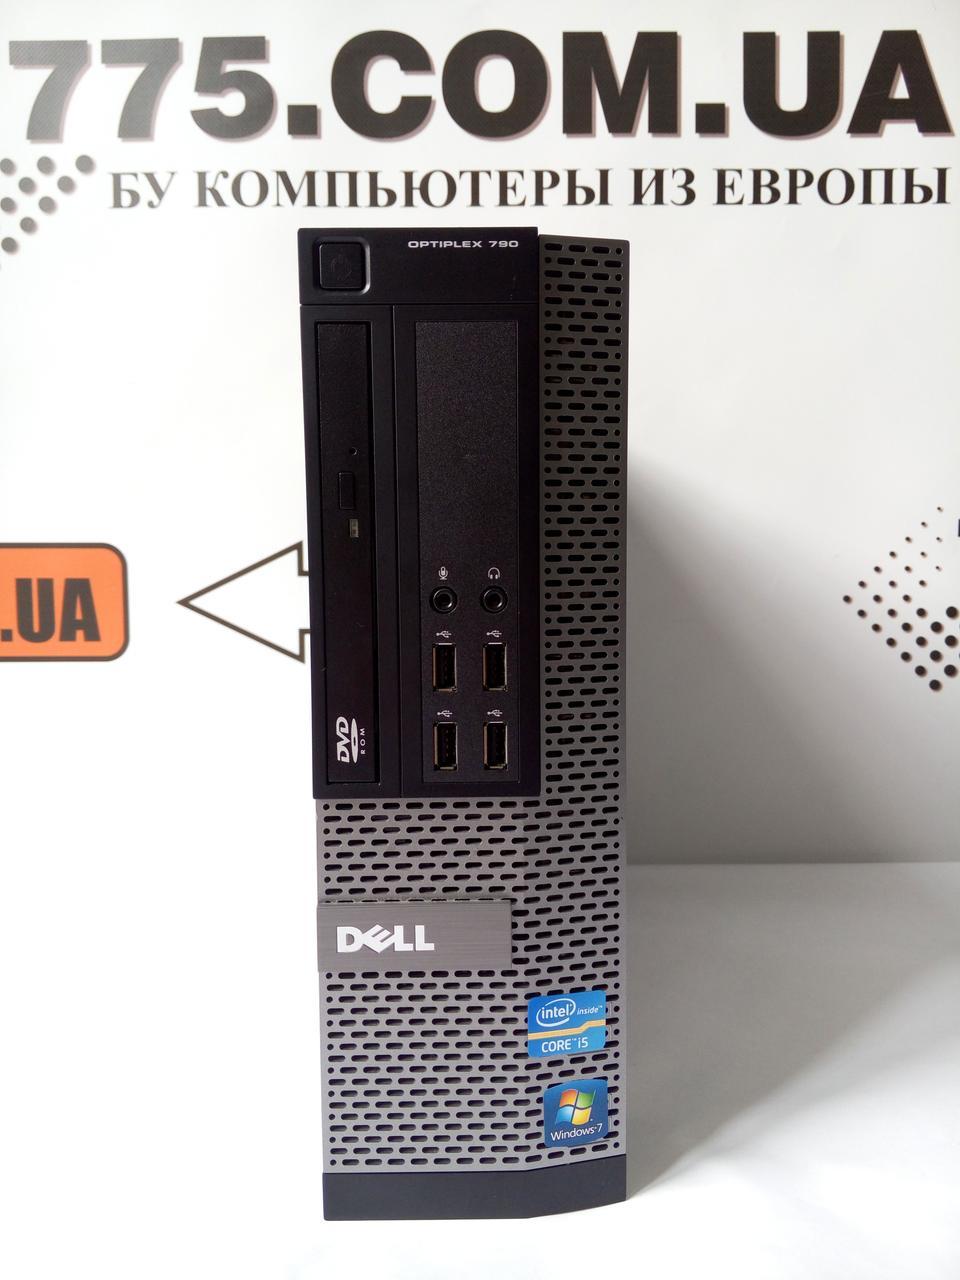 Компьютер SFF, Intel Pentium G870 3.1GHz, RAM 4ГБ, SSD 120ГБ, Супер цена!